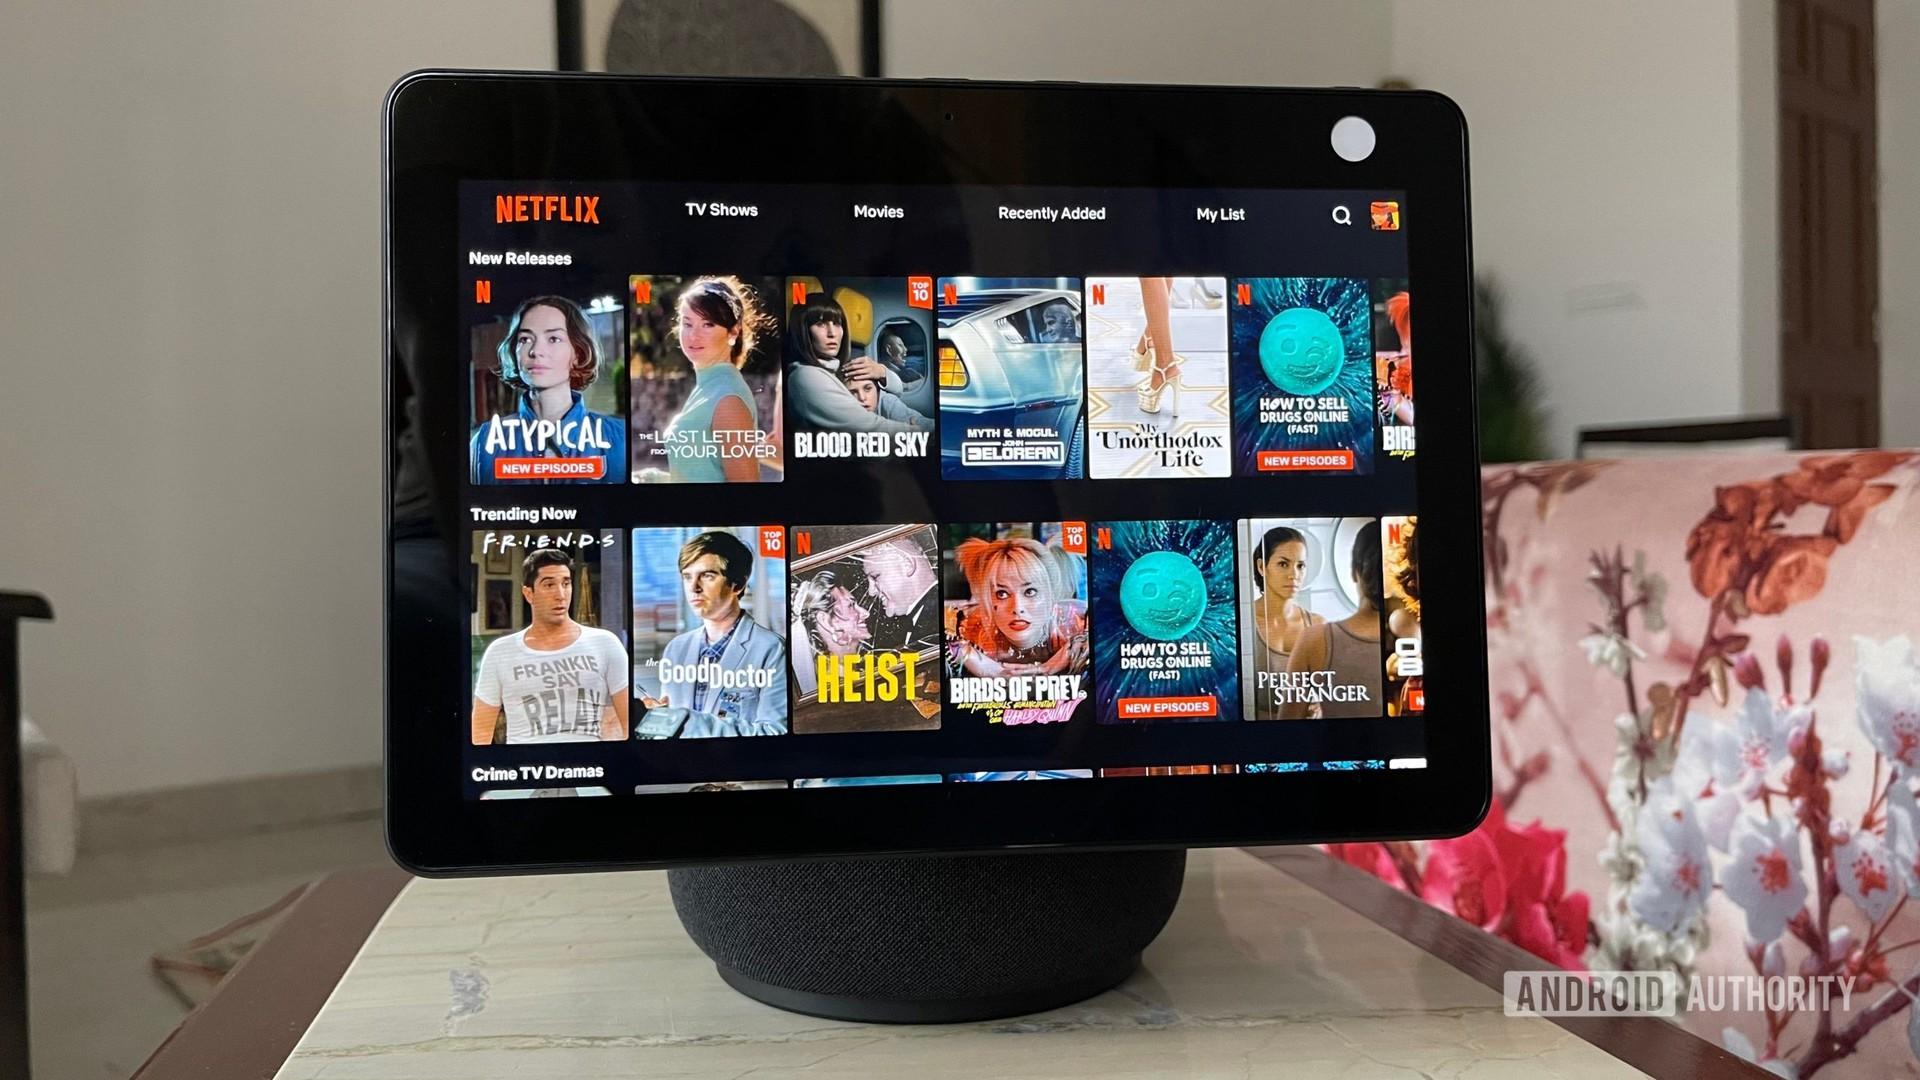 Apakah Netflix layak untuk berlangganan?  Netflix di Amazon Echo Show 10